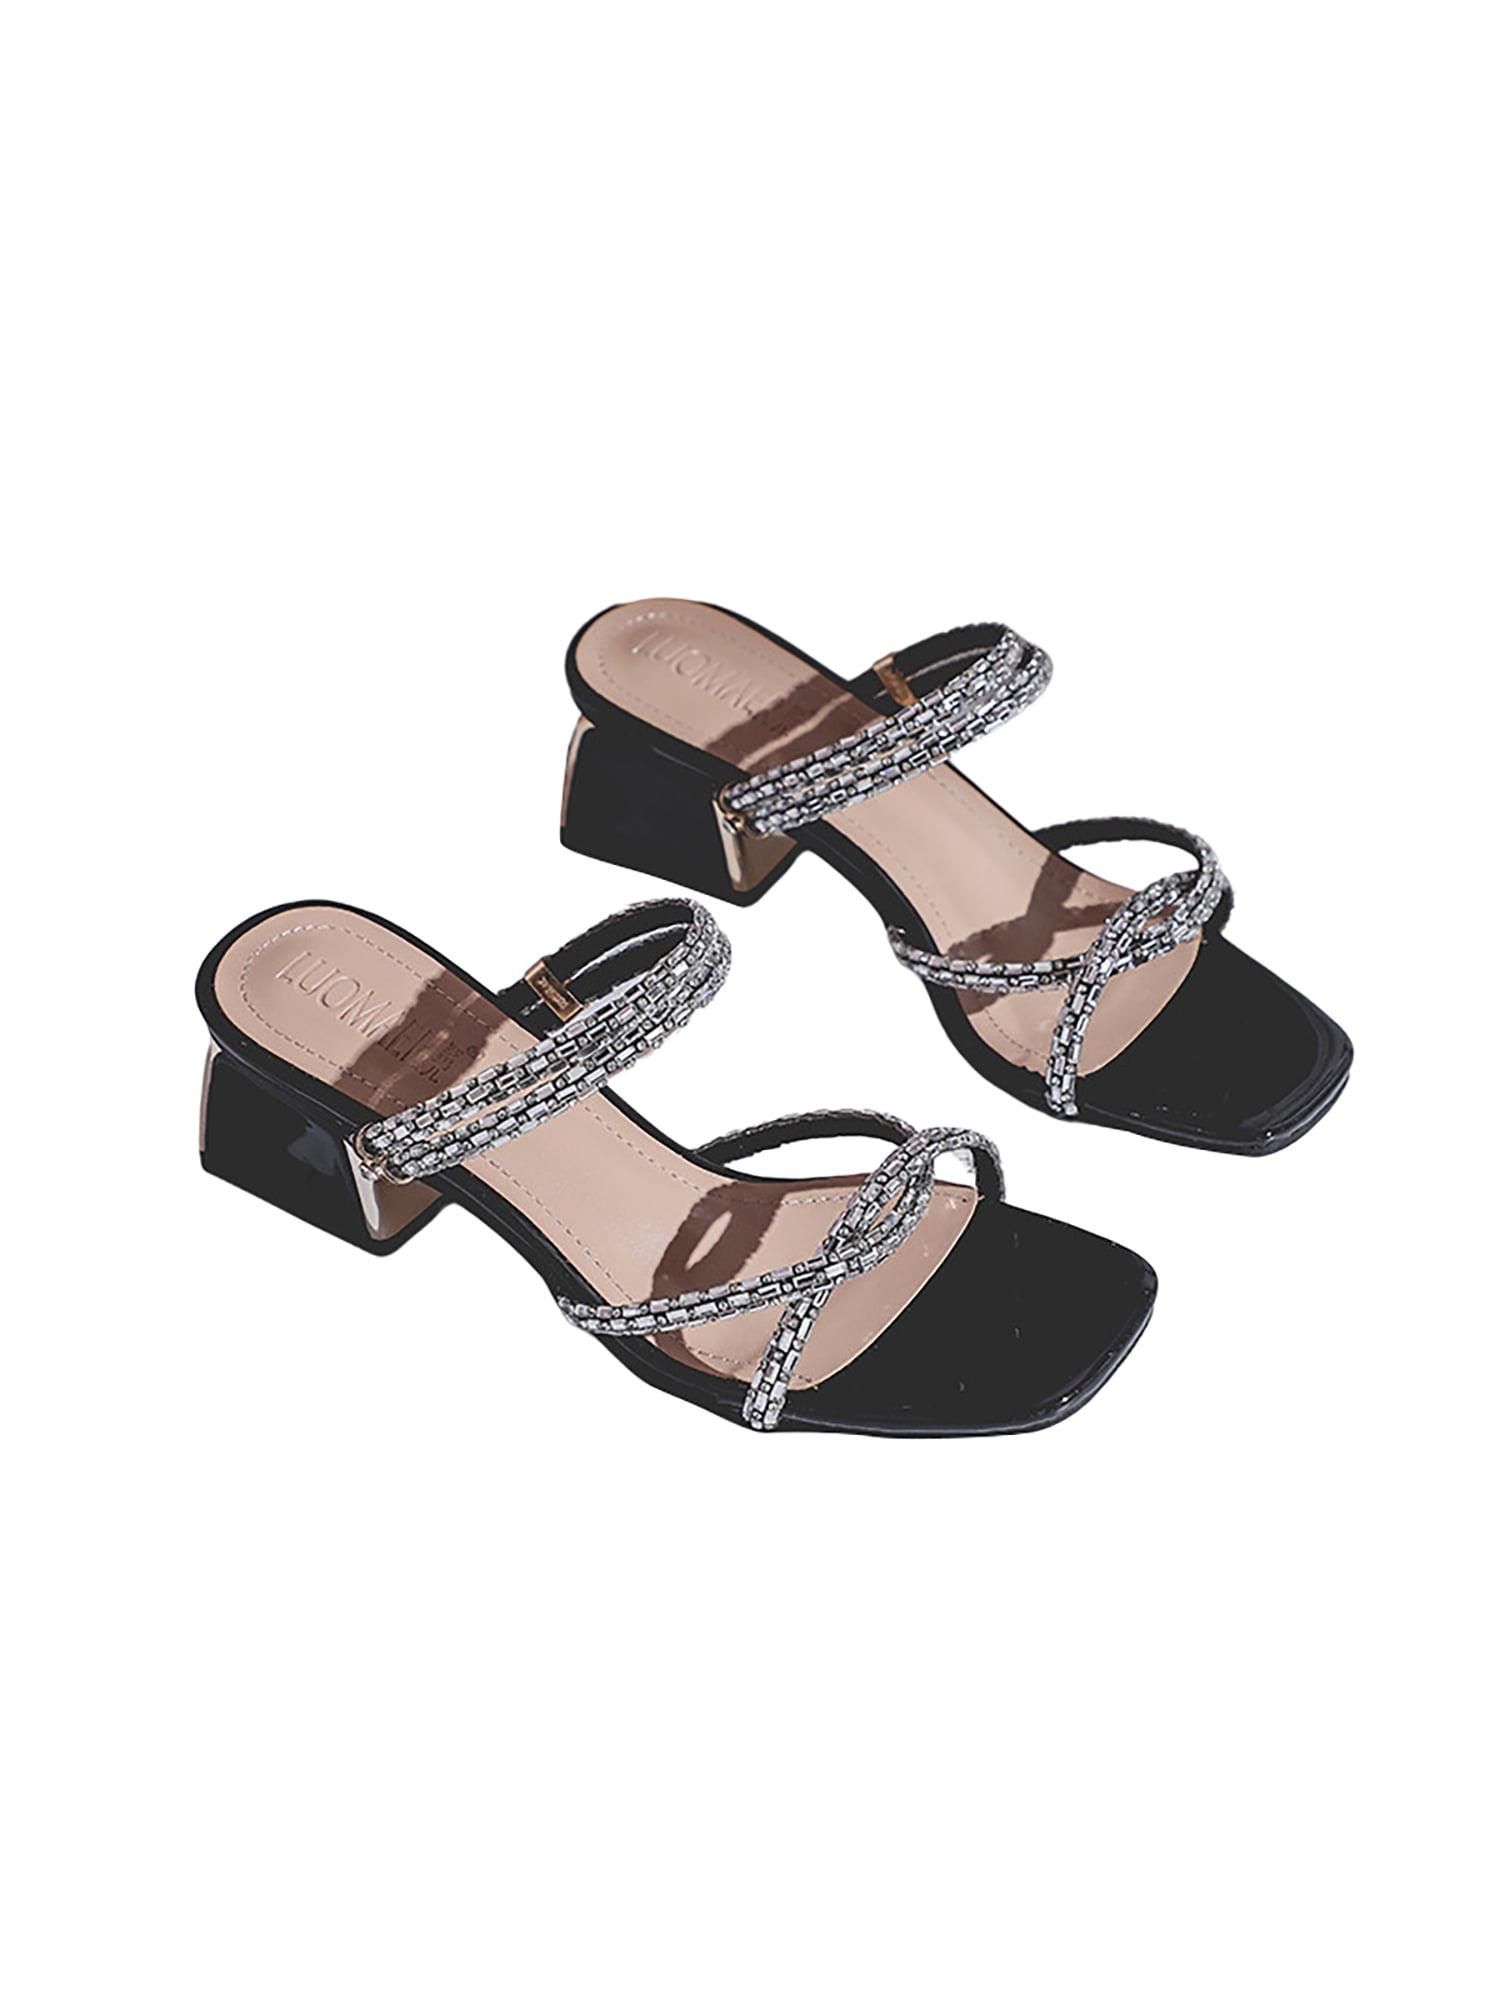 Details about  /Sexy Women/'s Peep Toe Stilettos High Heel Slipper Nightclub Sandals Backless B